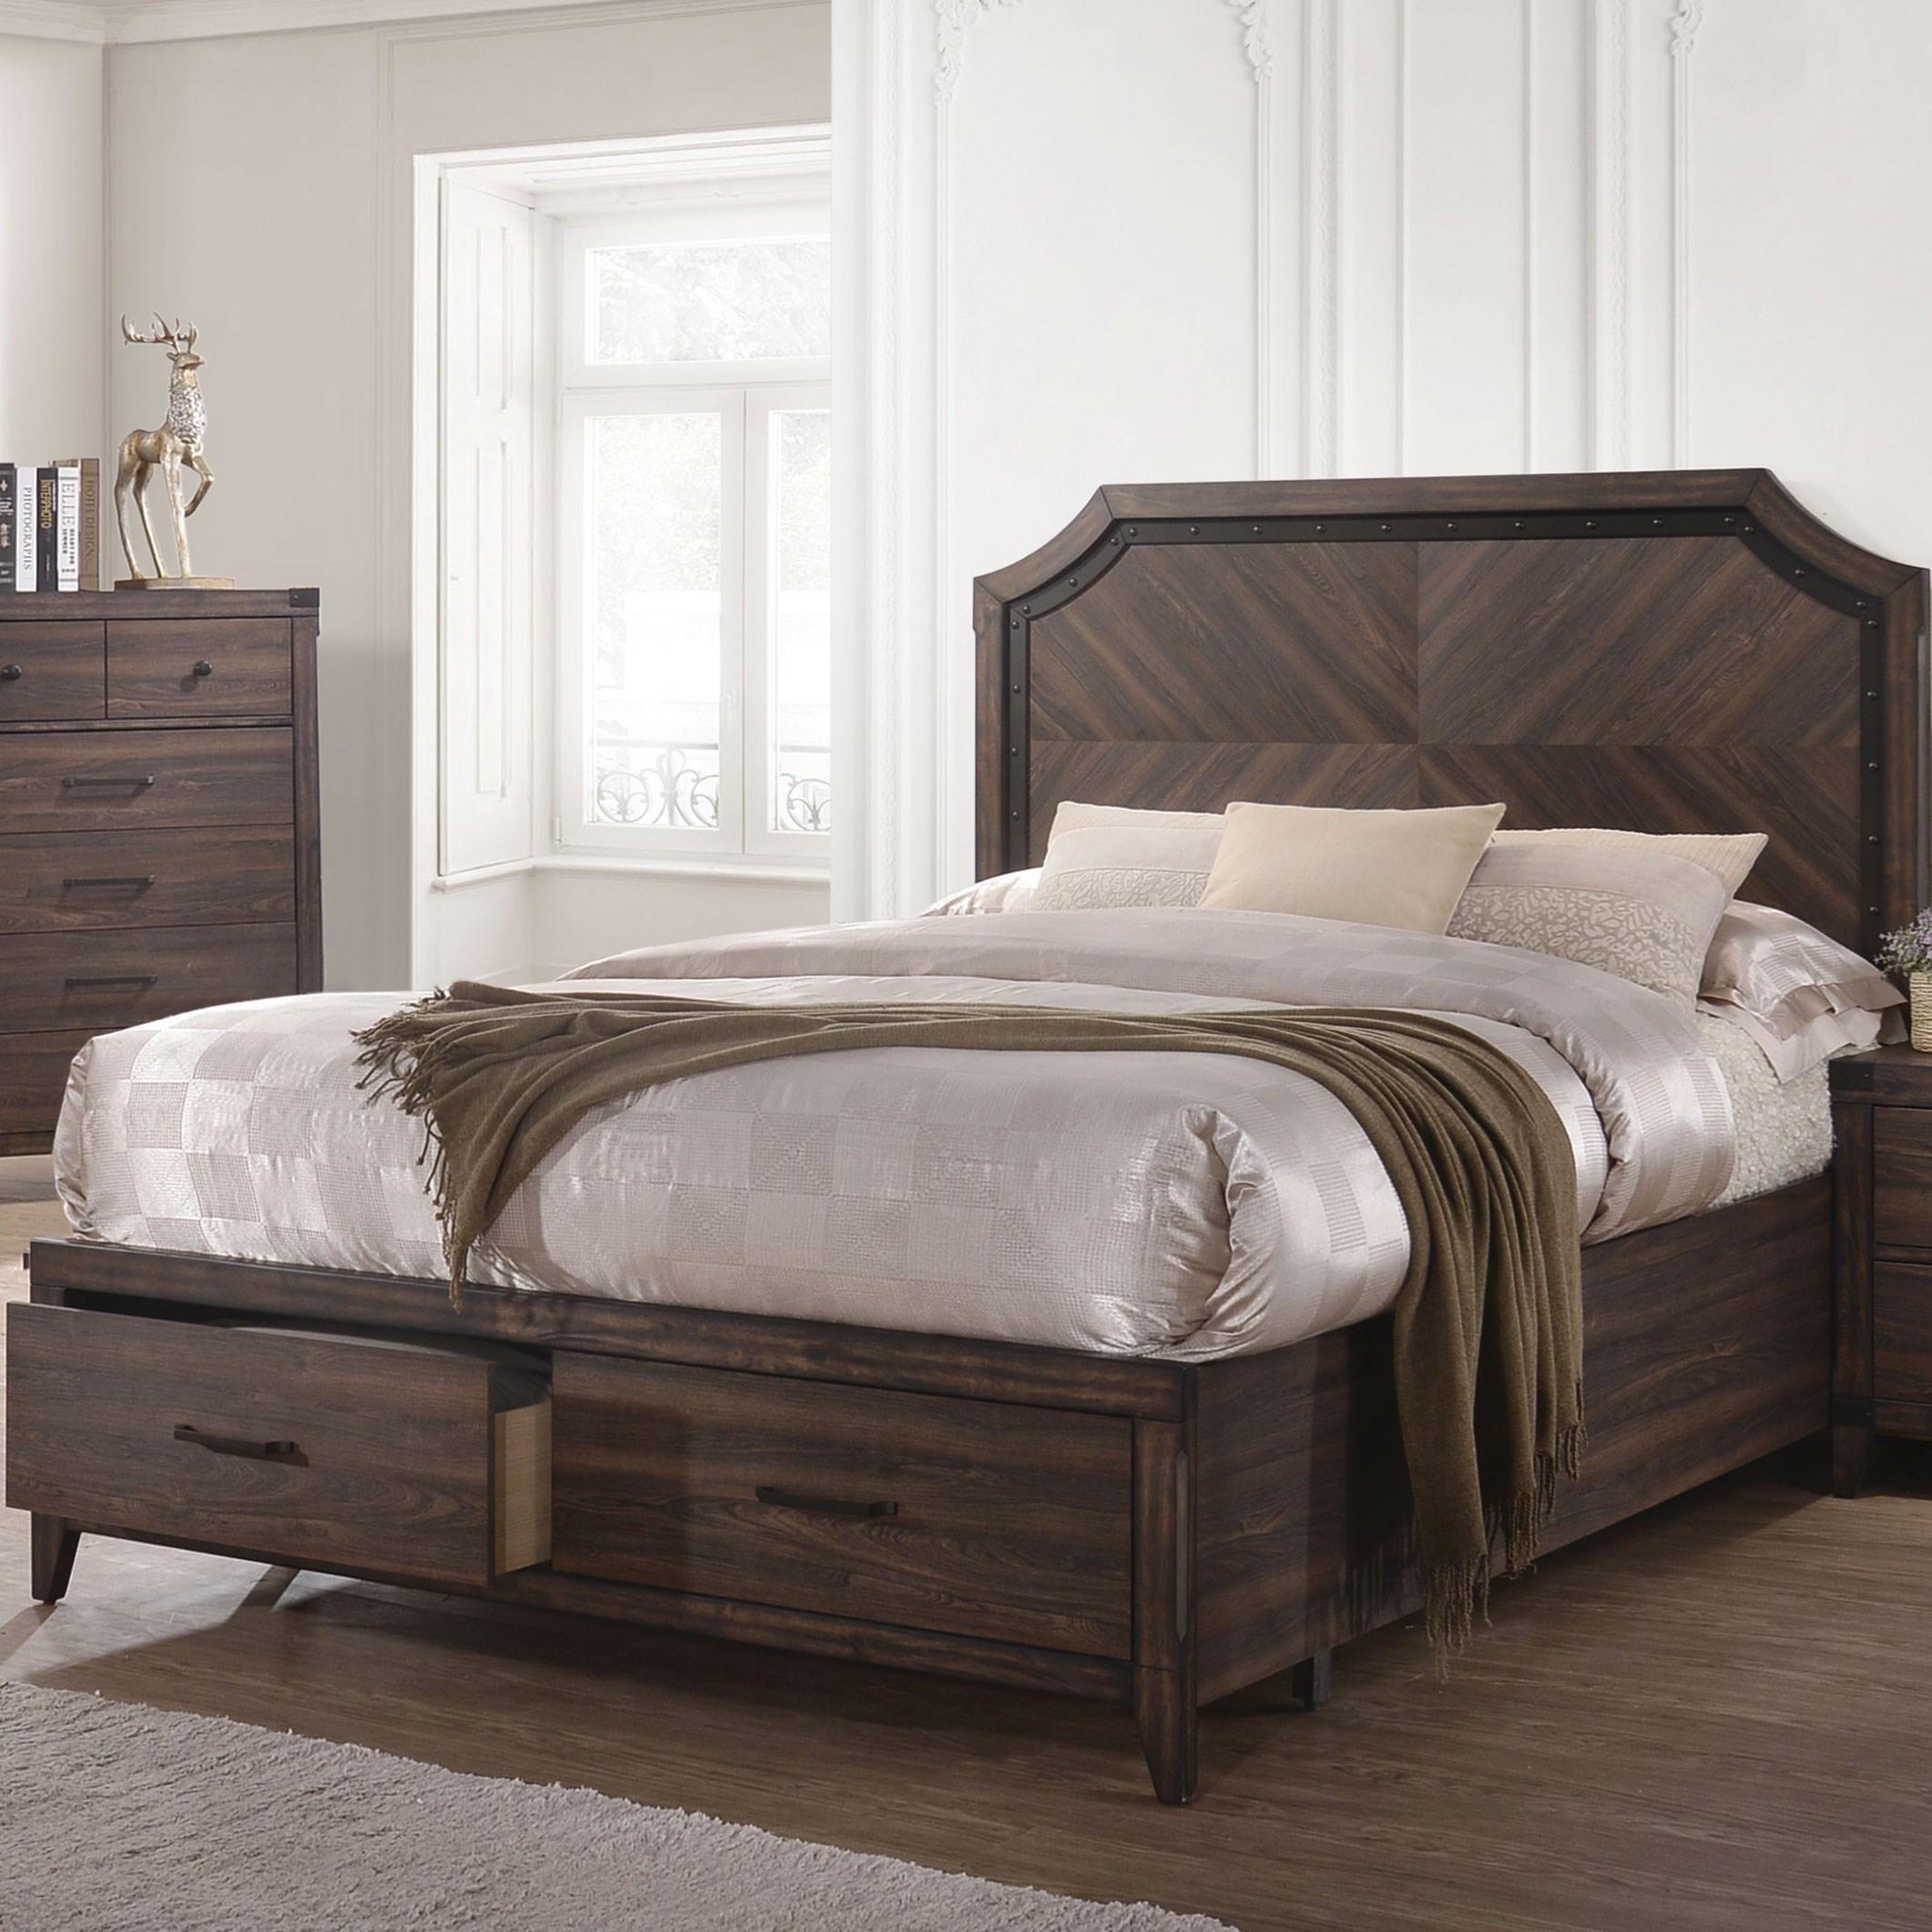 coaster richmond king platform bed with storage footboard. Black Bedroom Furniture Sets. Home Design Ideas